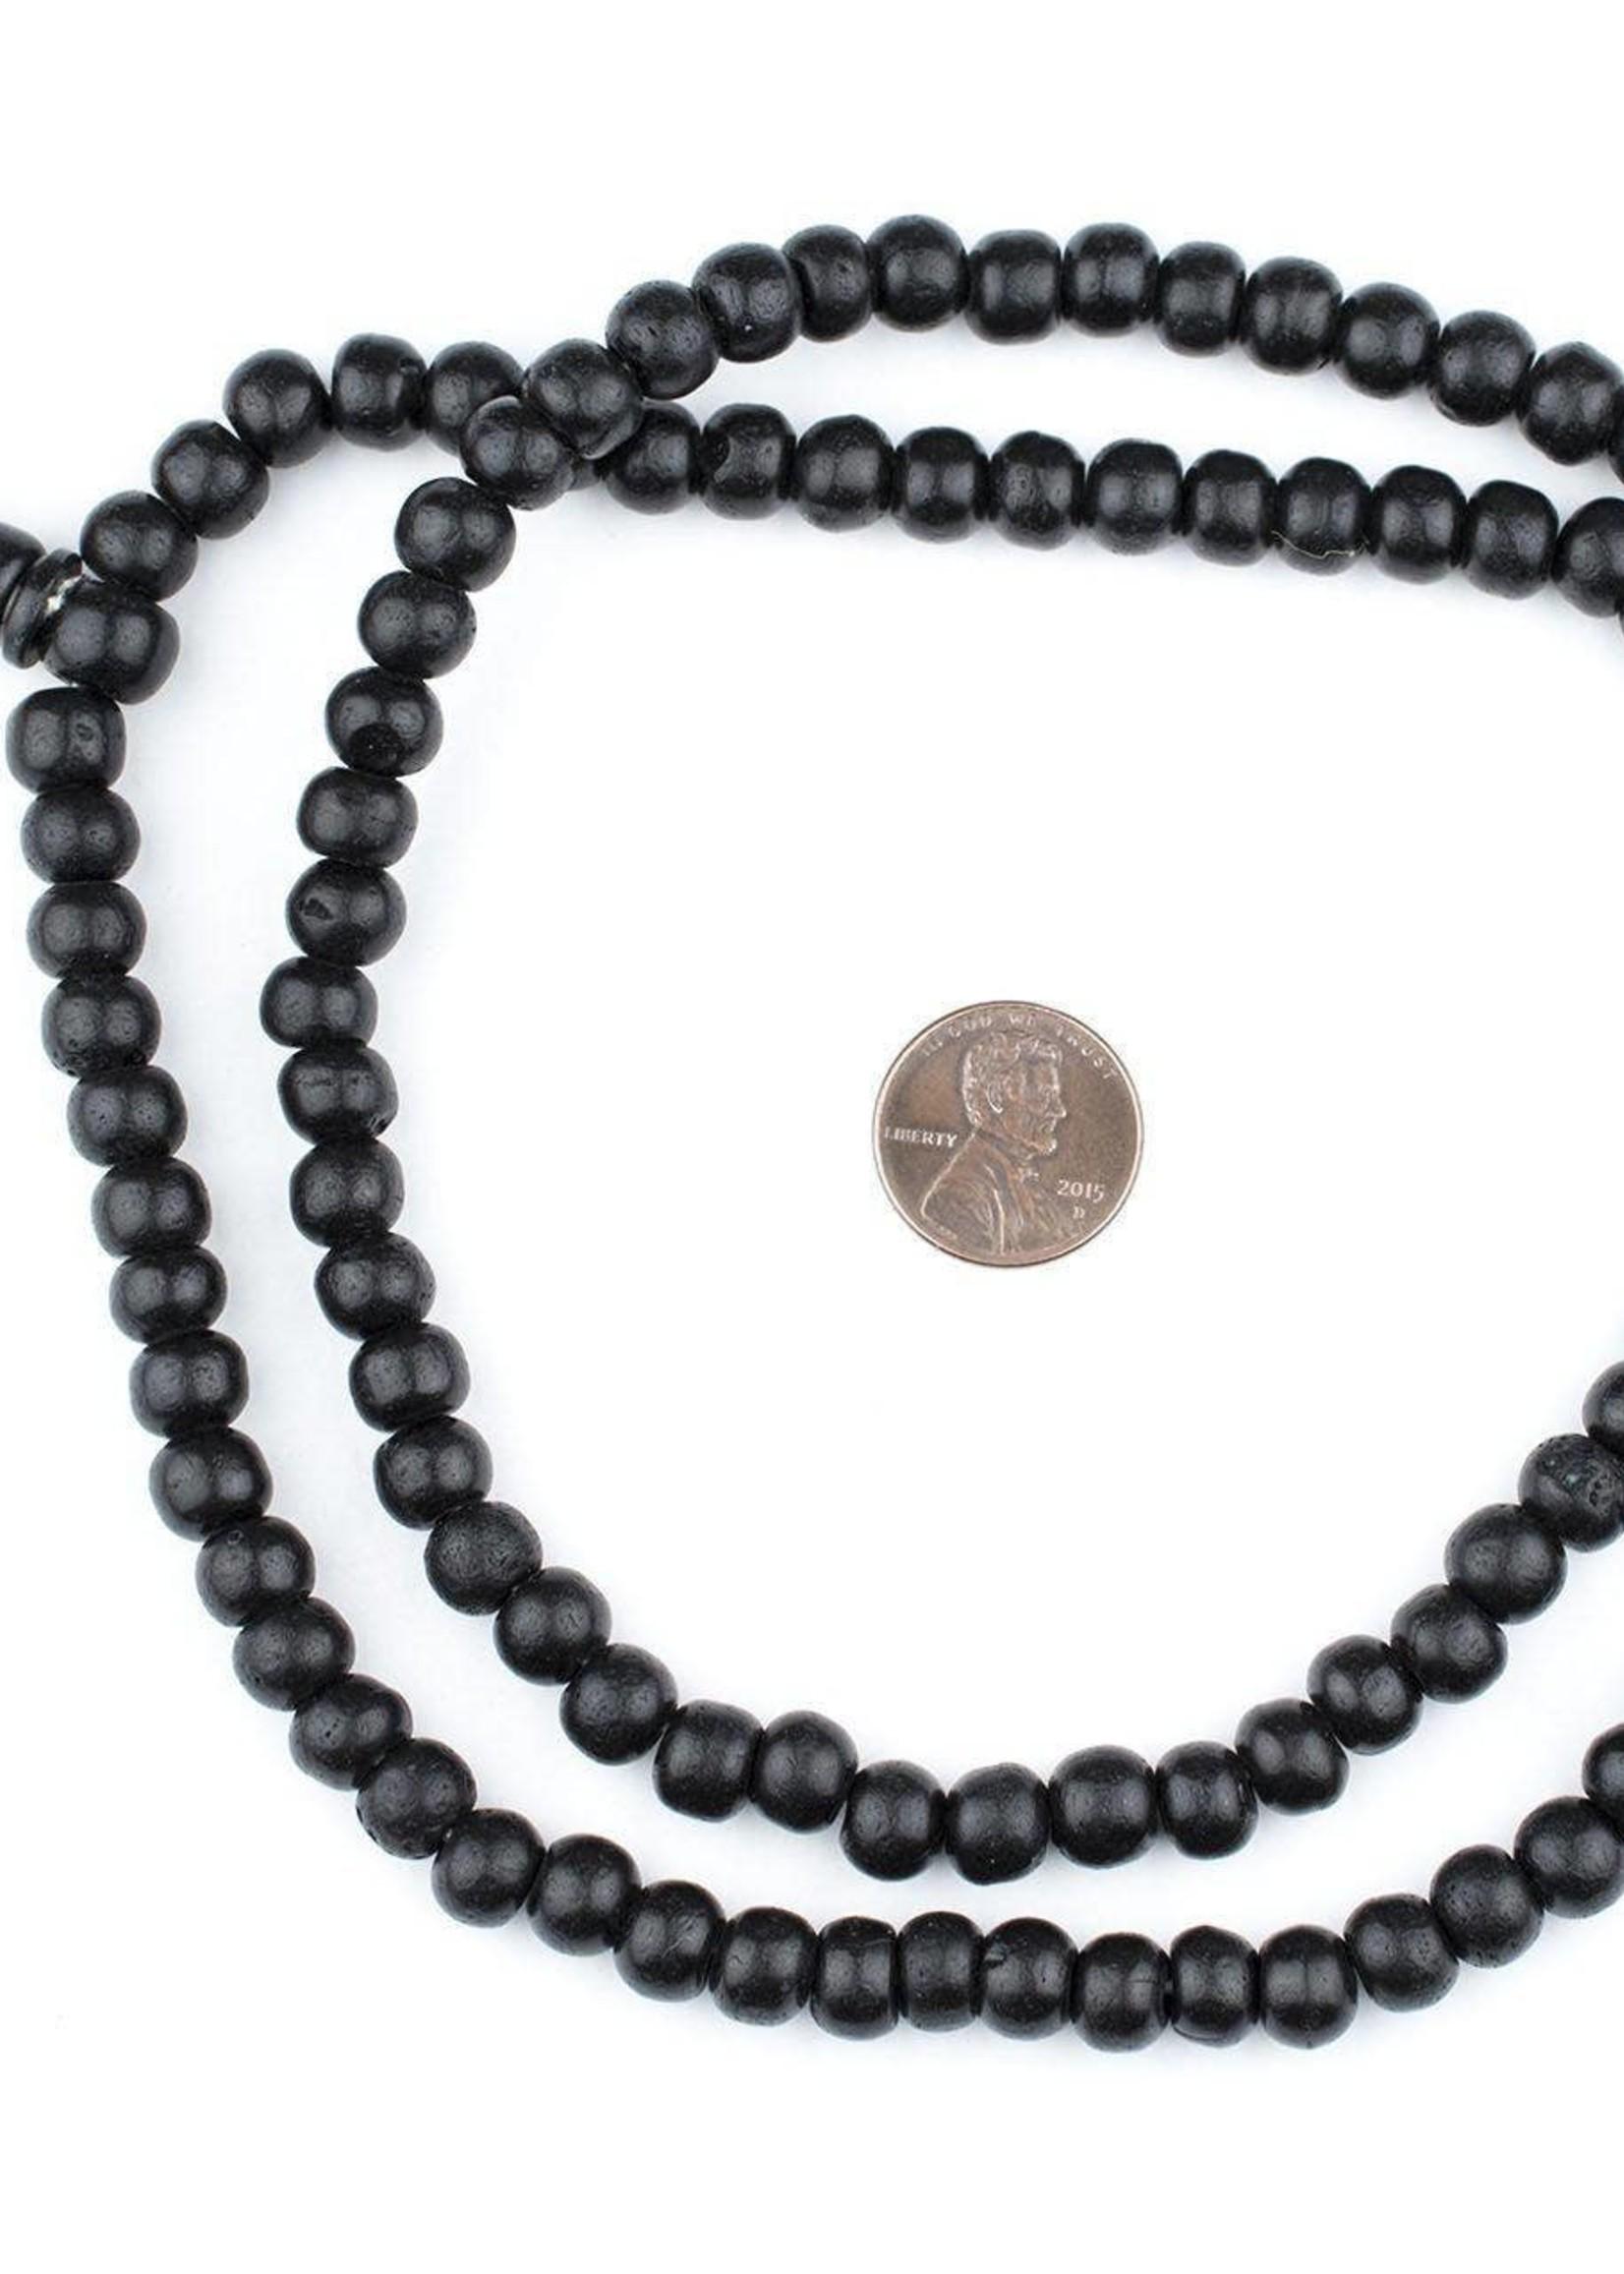 8mm Black Bone Mala Beads